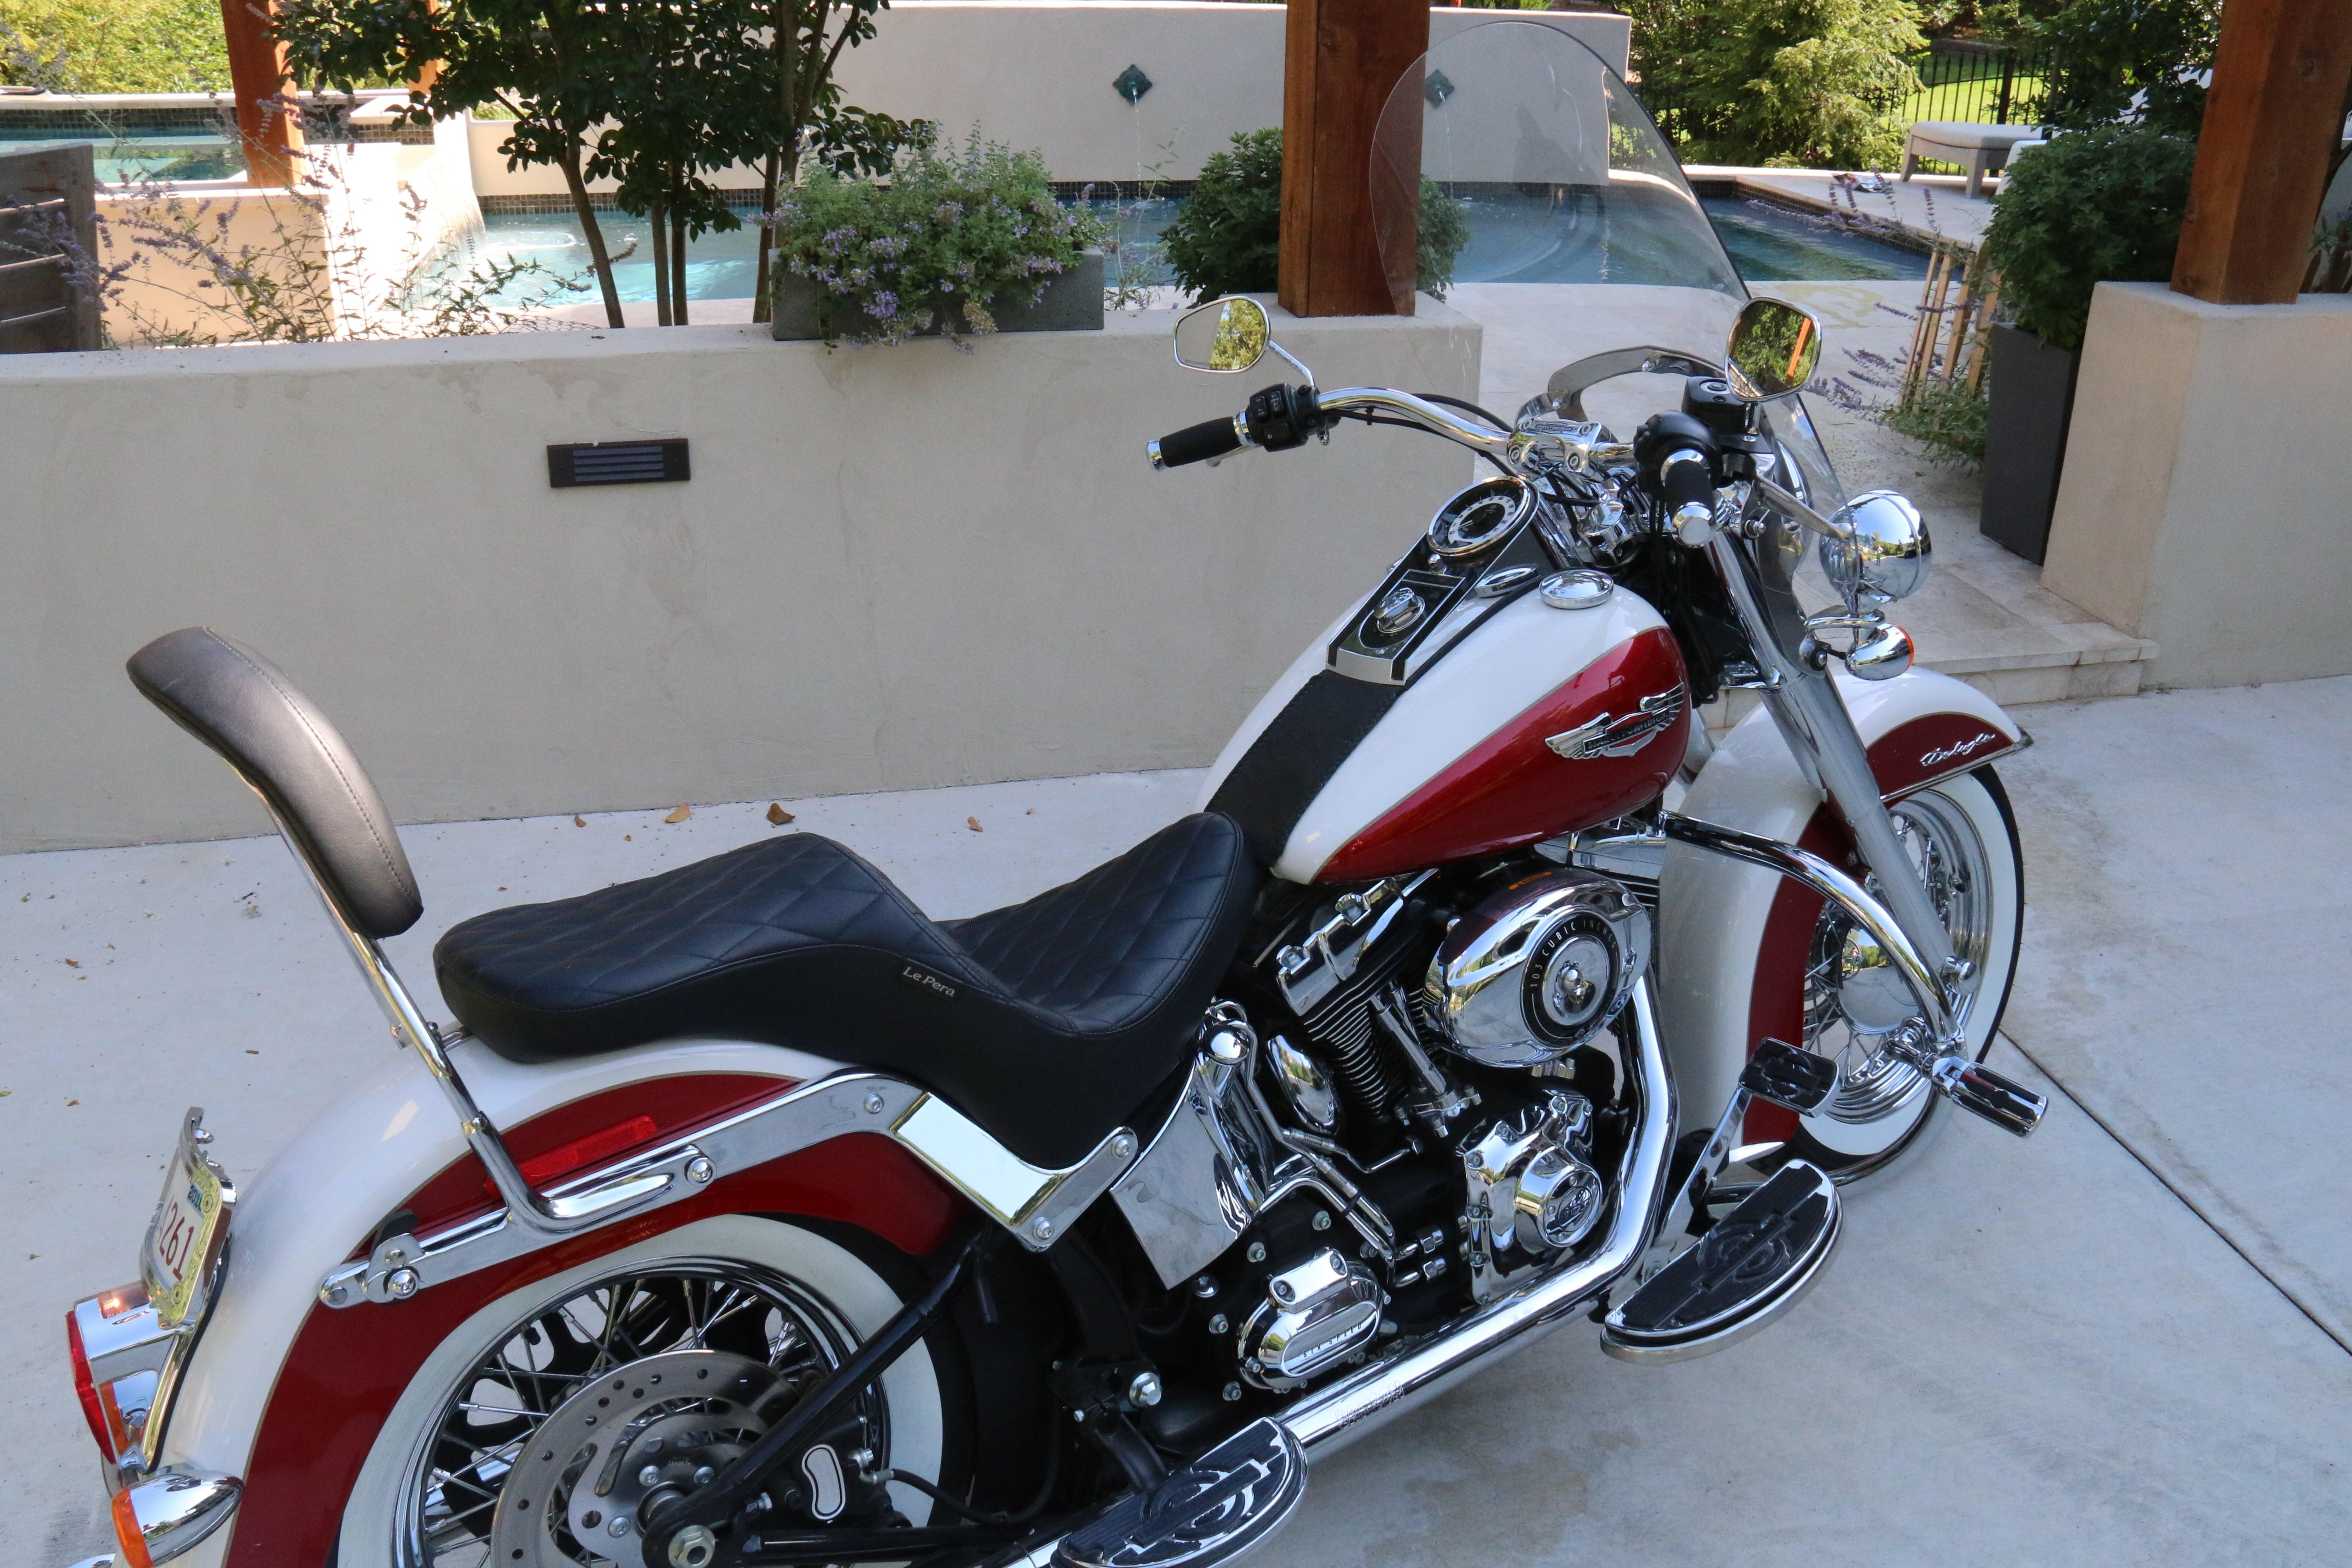 Nada Motorcycle Value >> 2013 Harley-Davidson® FLSTN Softail® Deluxe (Red/White), Tulsa, Oklahoma (646697) | ChopperExchange